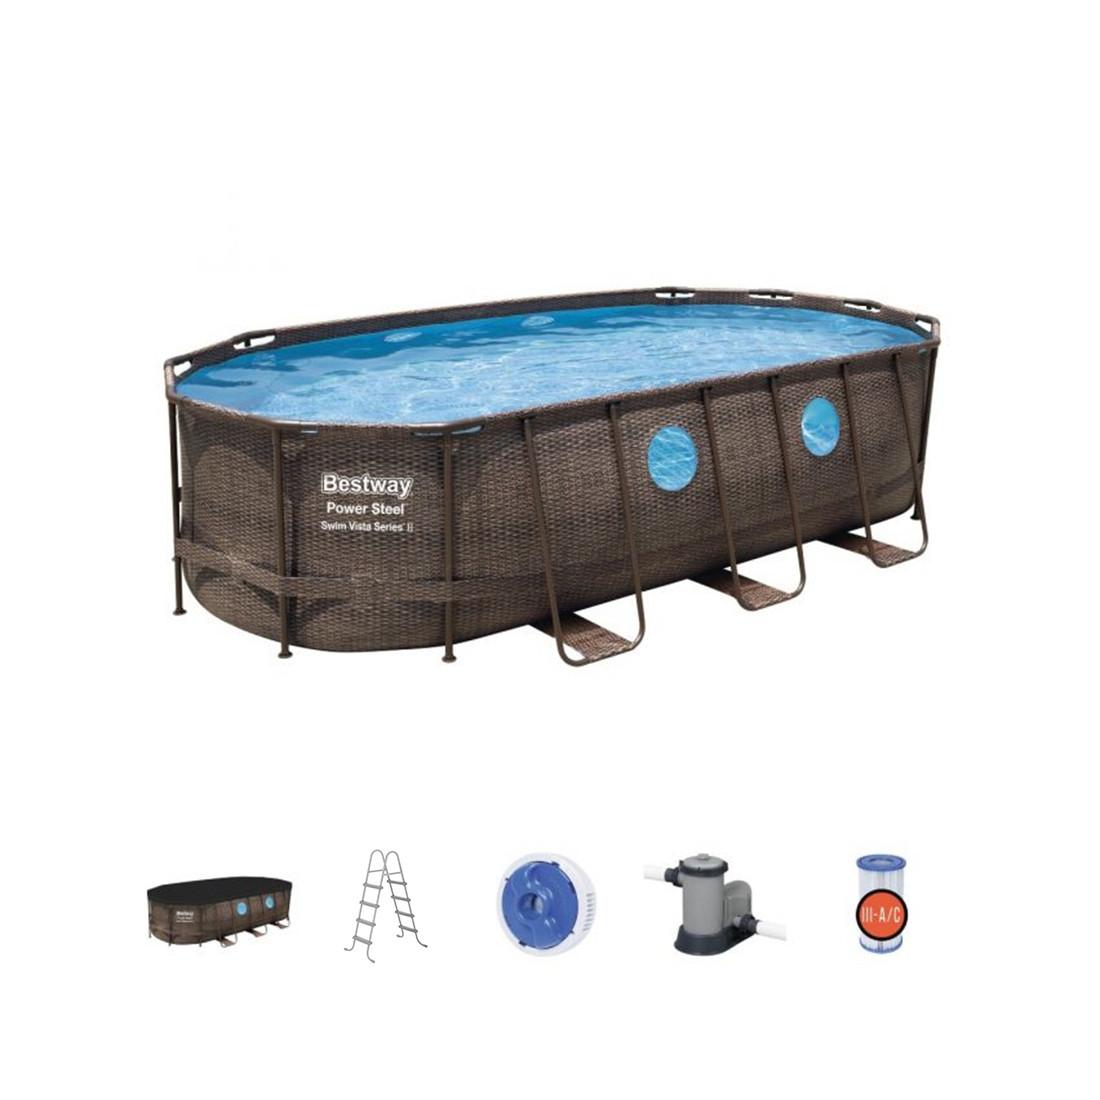 Каркасный бассейн Power Steel Swim Vista II 549 х 274 x 122 см, BESTWAY, 56716